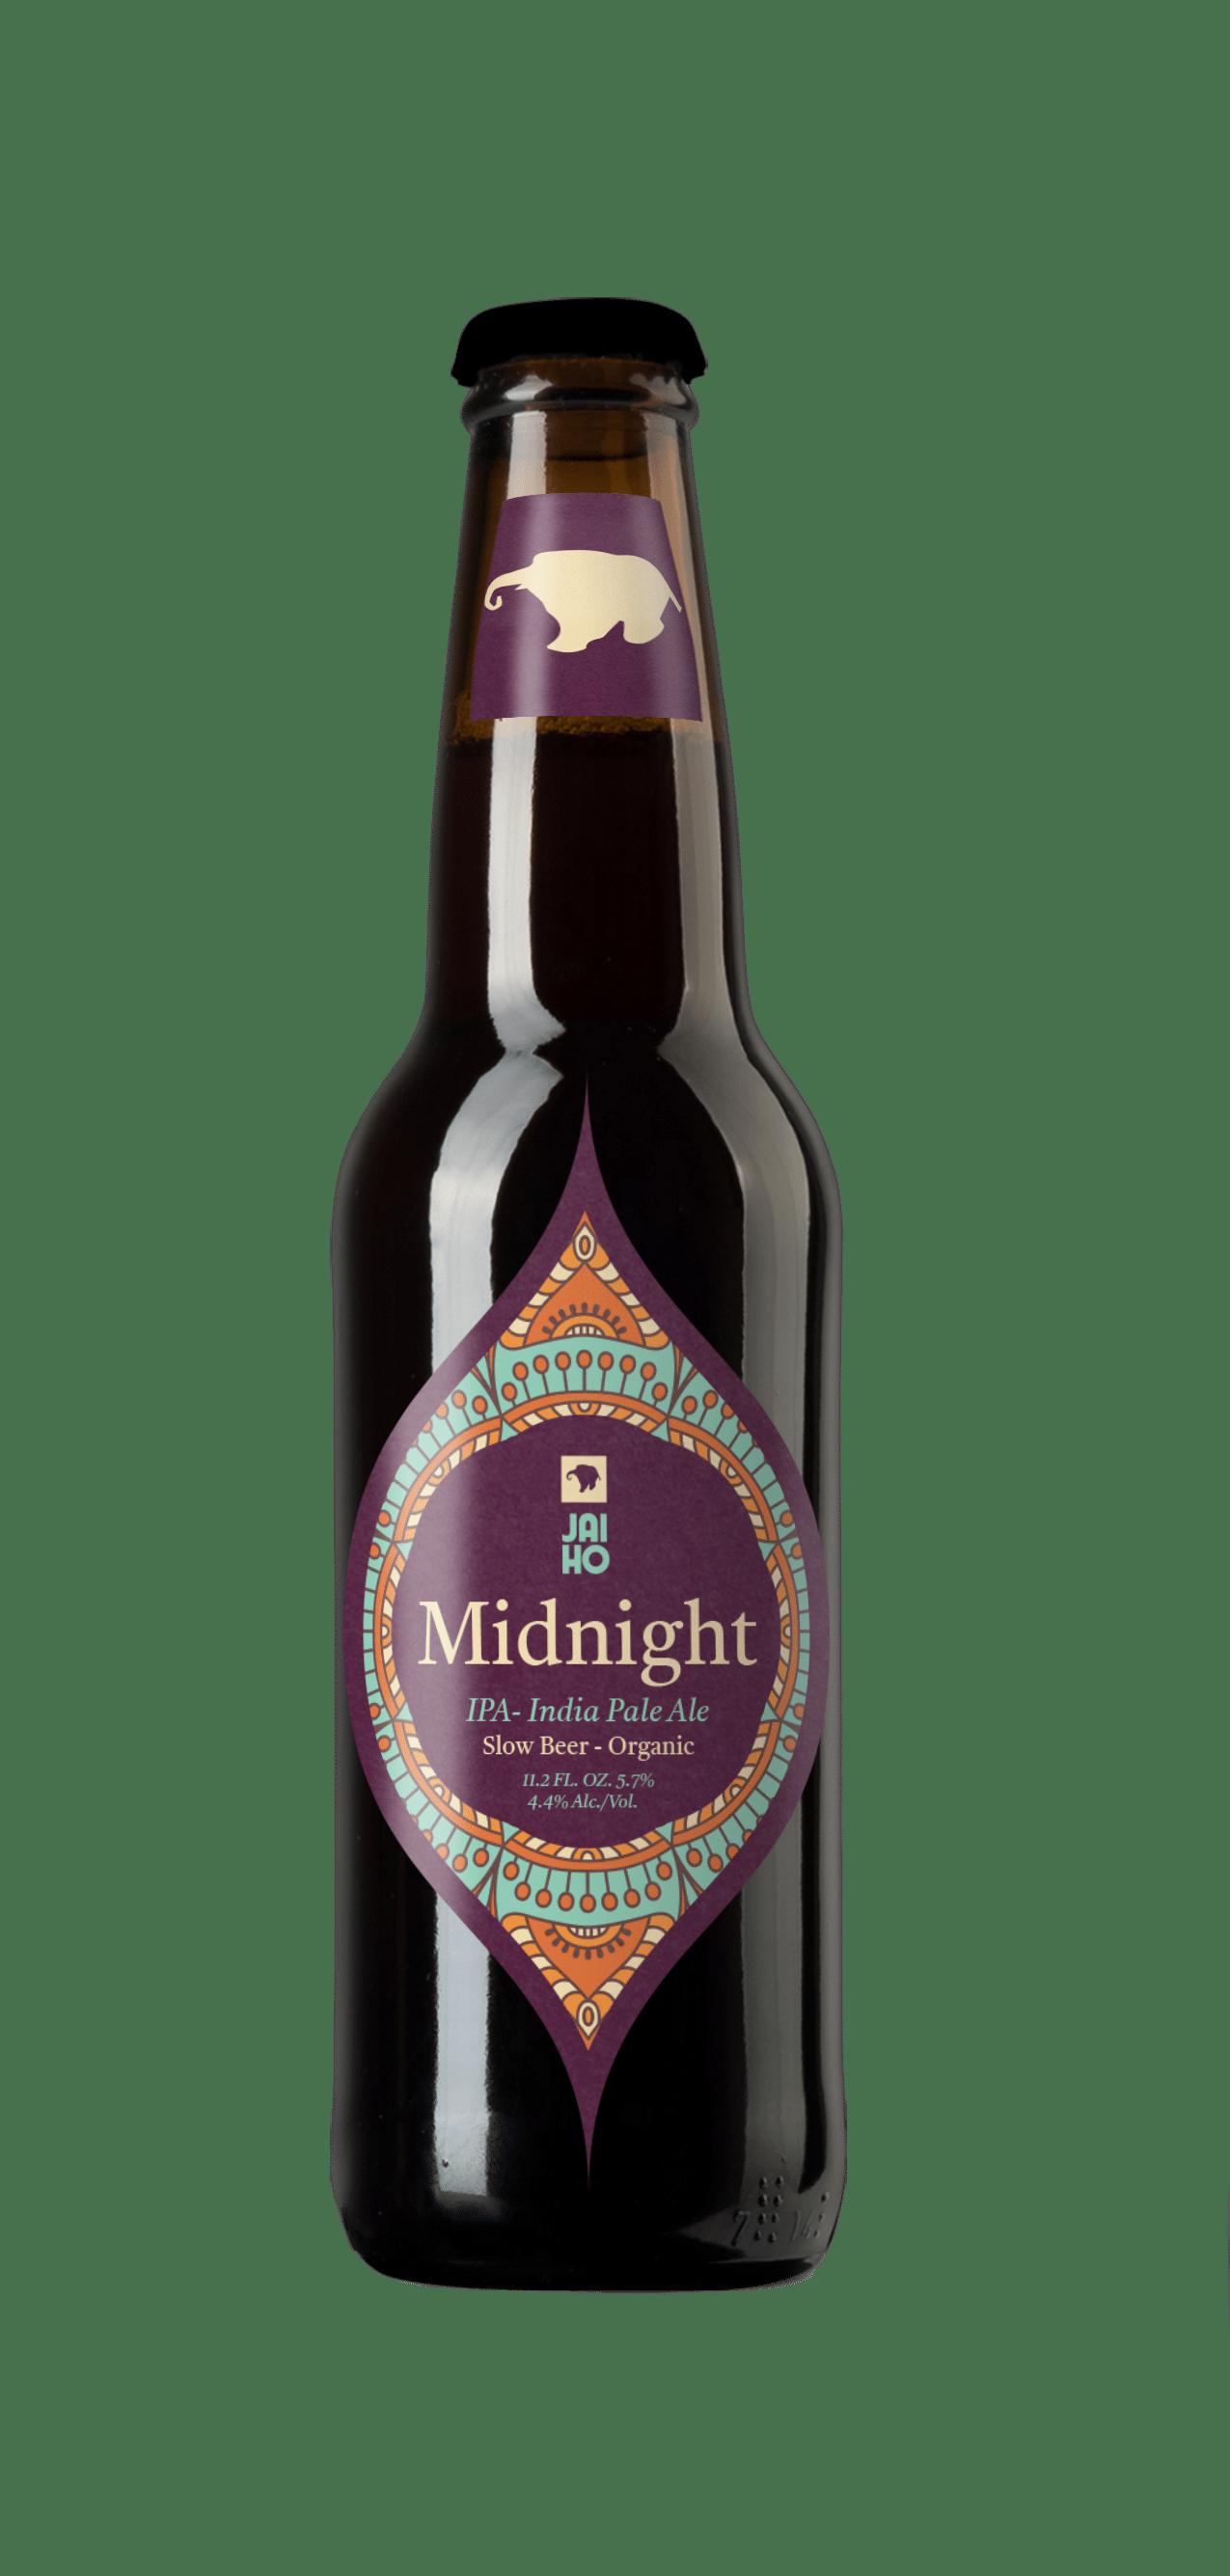 Midnight Front Bottle